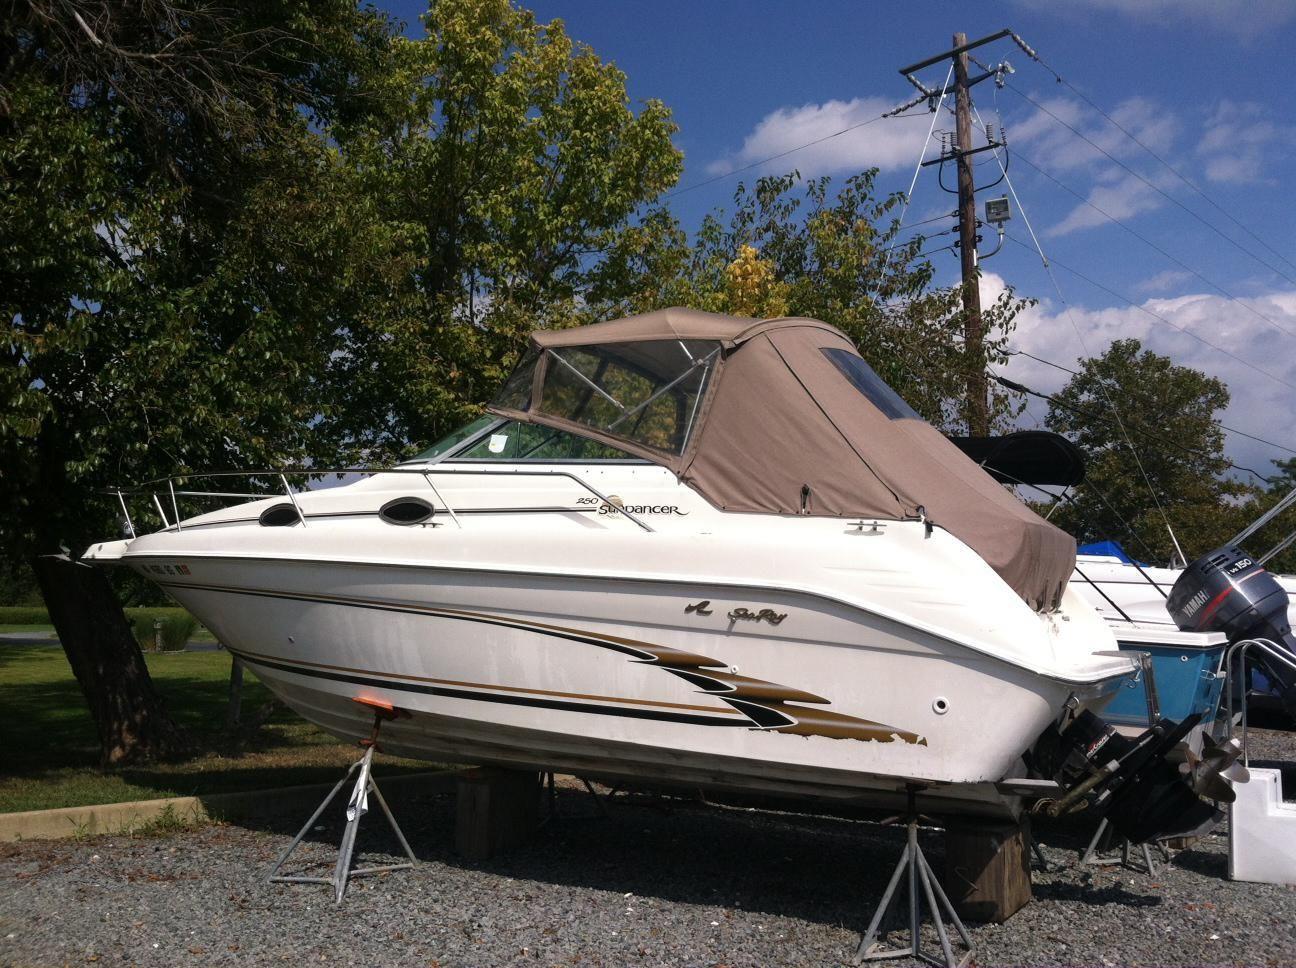 1998 Sea Ray 250 Sundancer Clarks Landing - Annapolis Area ...